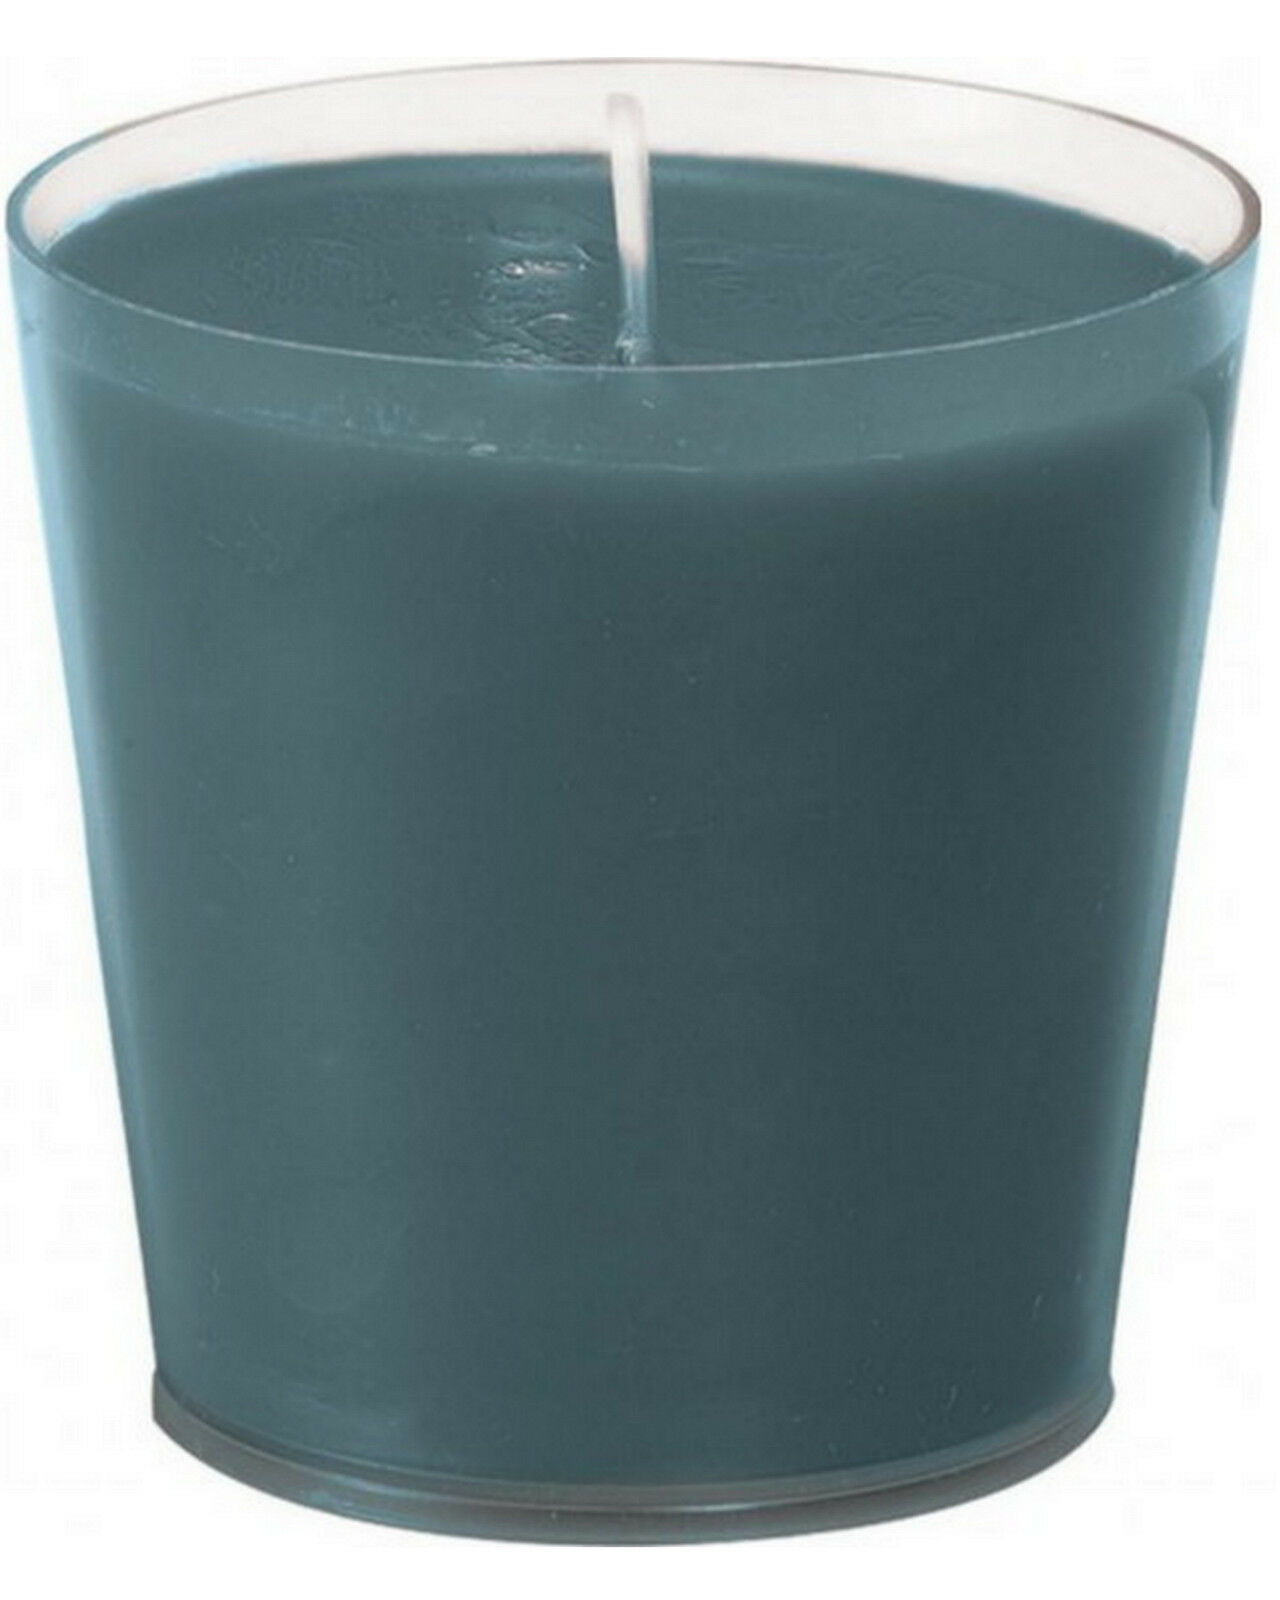 6-12 Stück Nachfüller Kerze 65 x 65mm 30h Acryl Cup Refill Wachs für Kerzenglas - Blau-Grau, 12 Stück